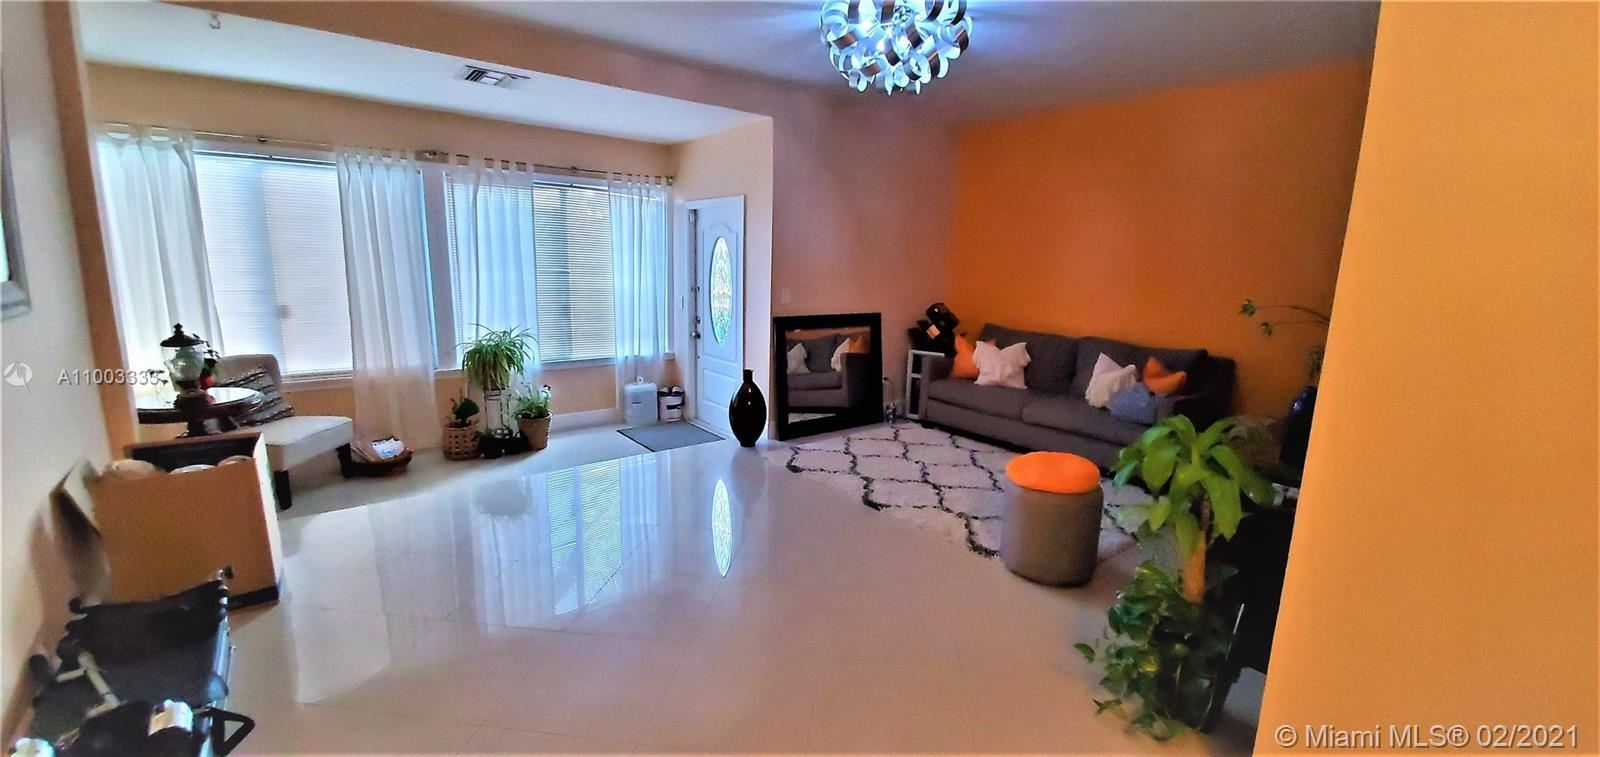 Photo of 6121 Royal Palm Blvd, Margate, FL 33063 (MLS # A11003333)